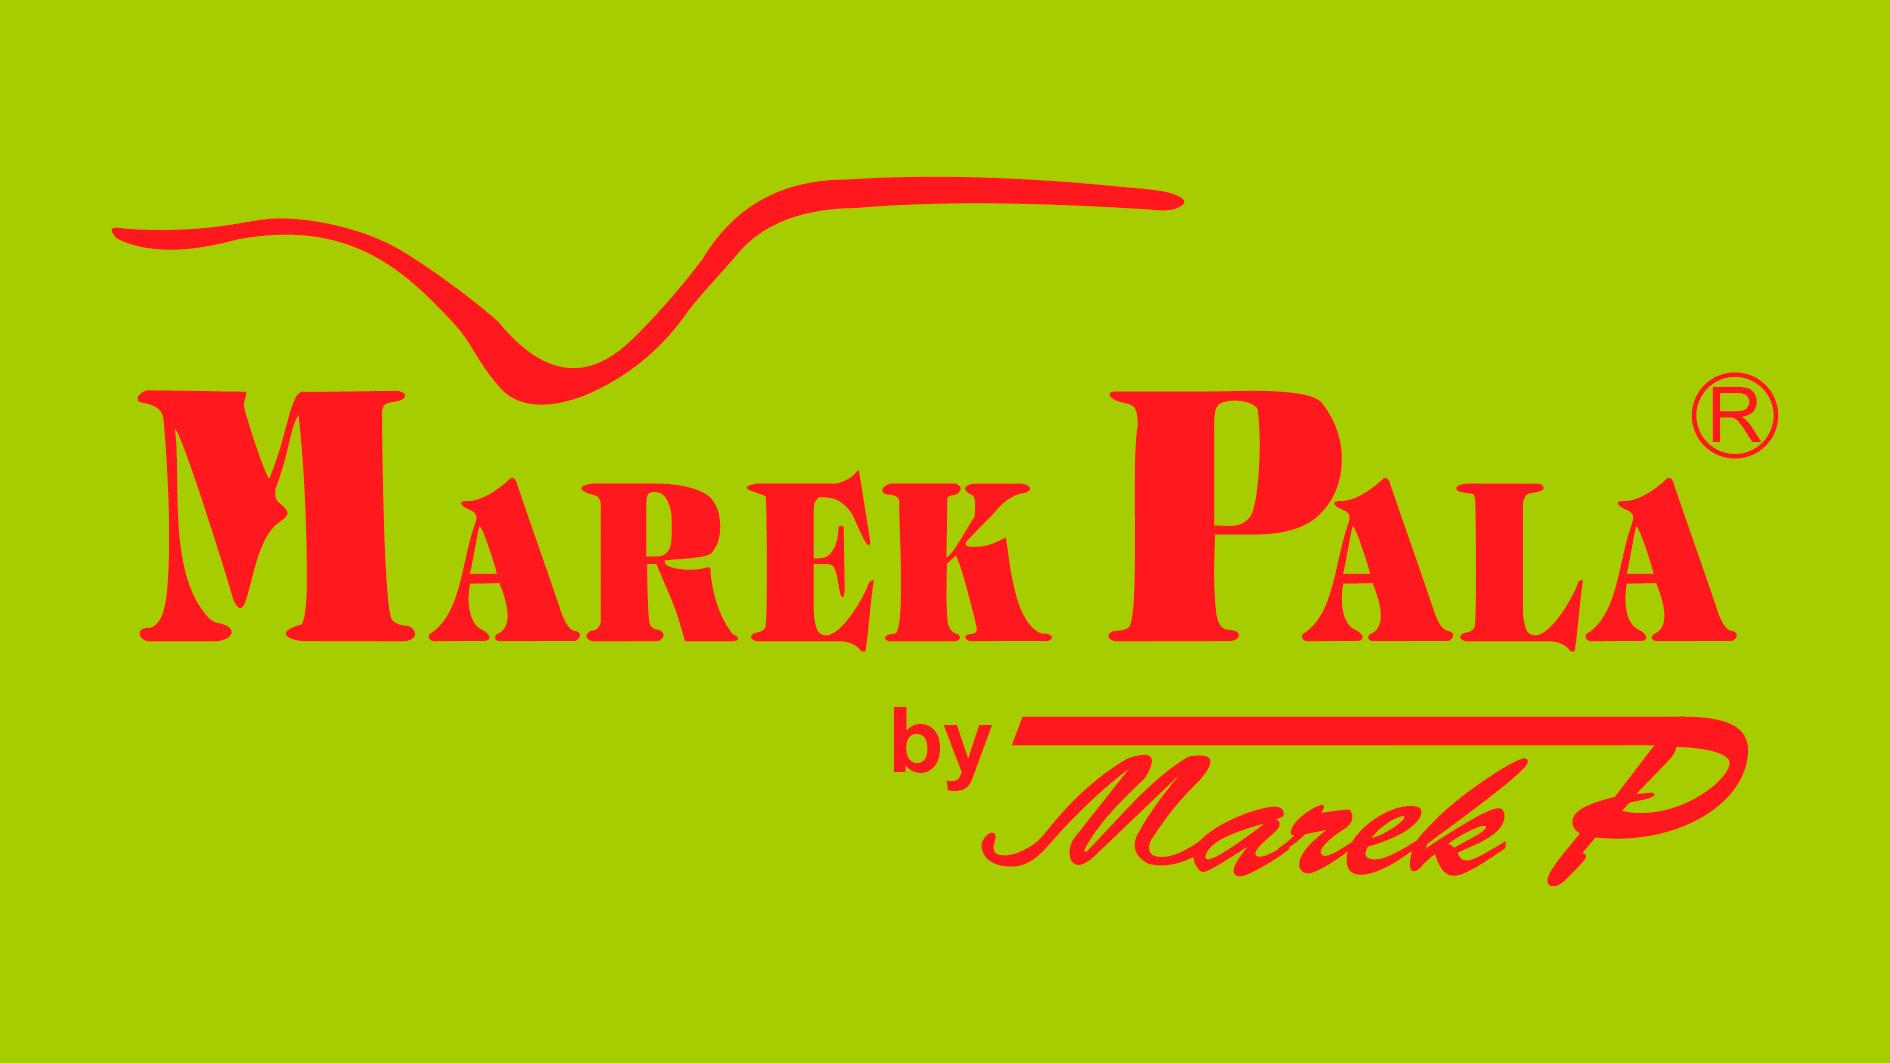 Marek Pala